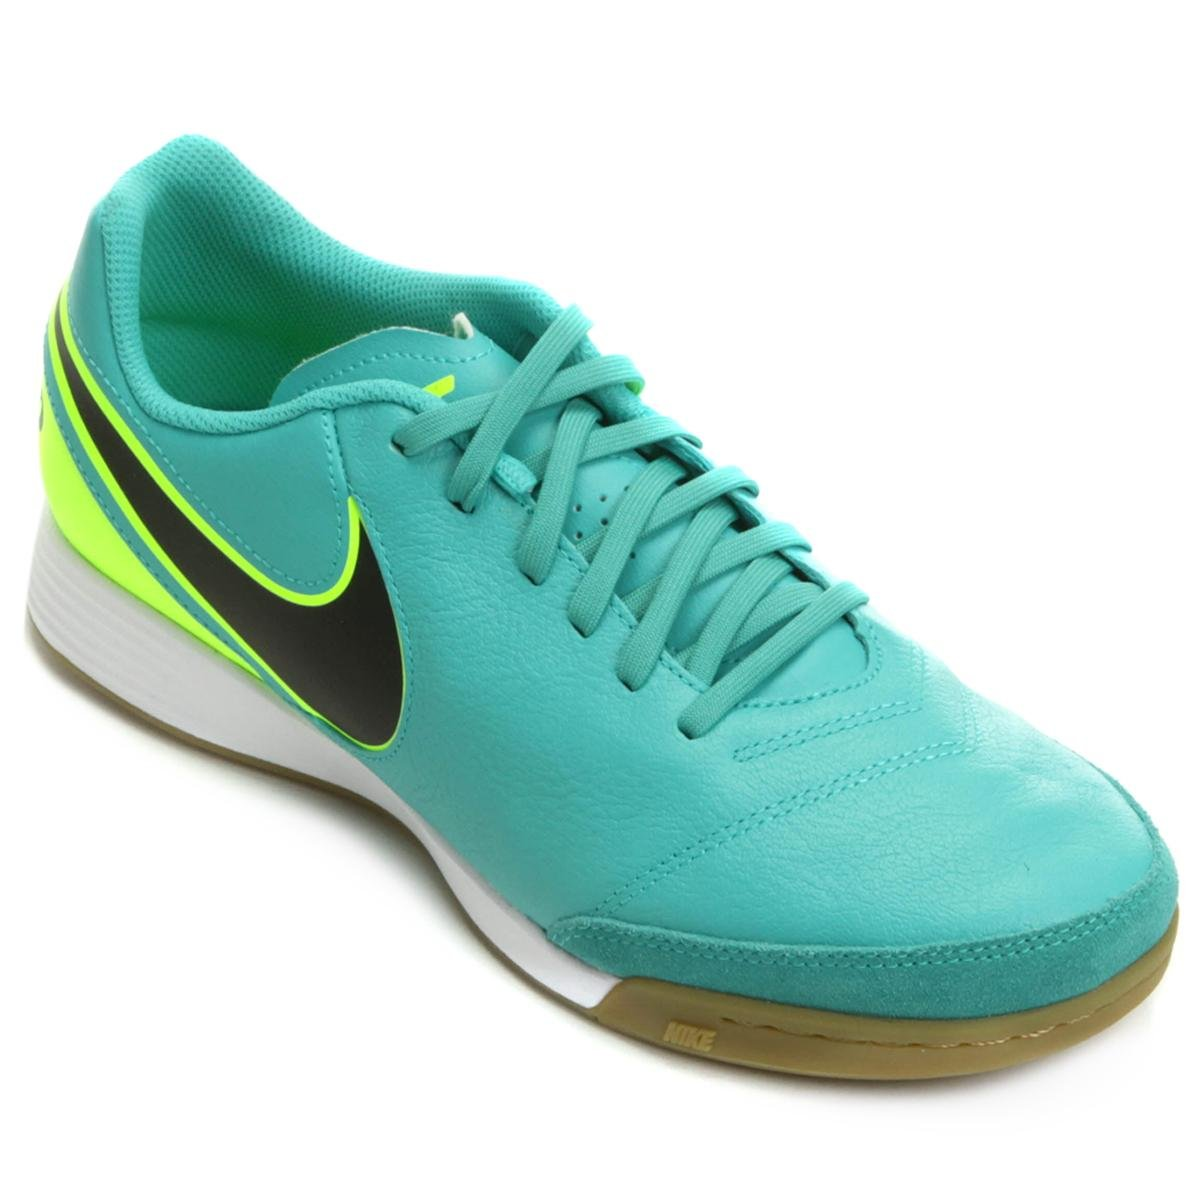 ec209f7fca Chuteira Futsal Nike Tiempo Genio 2 Leather IC Masculina - Compre Agora